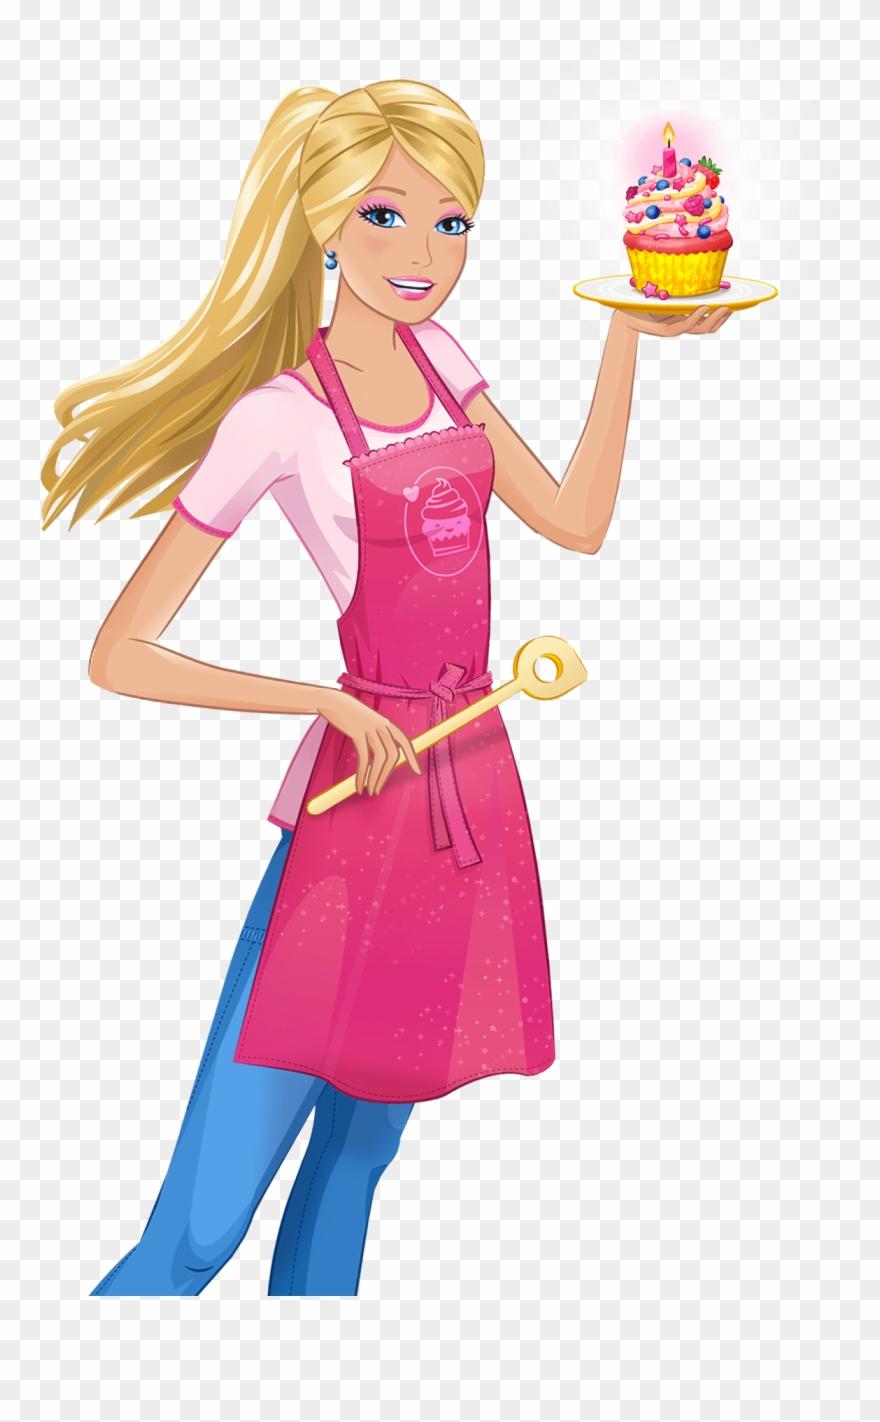 Iron on cartoon png. Barbie clipart transparent